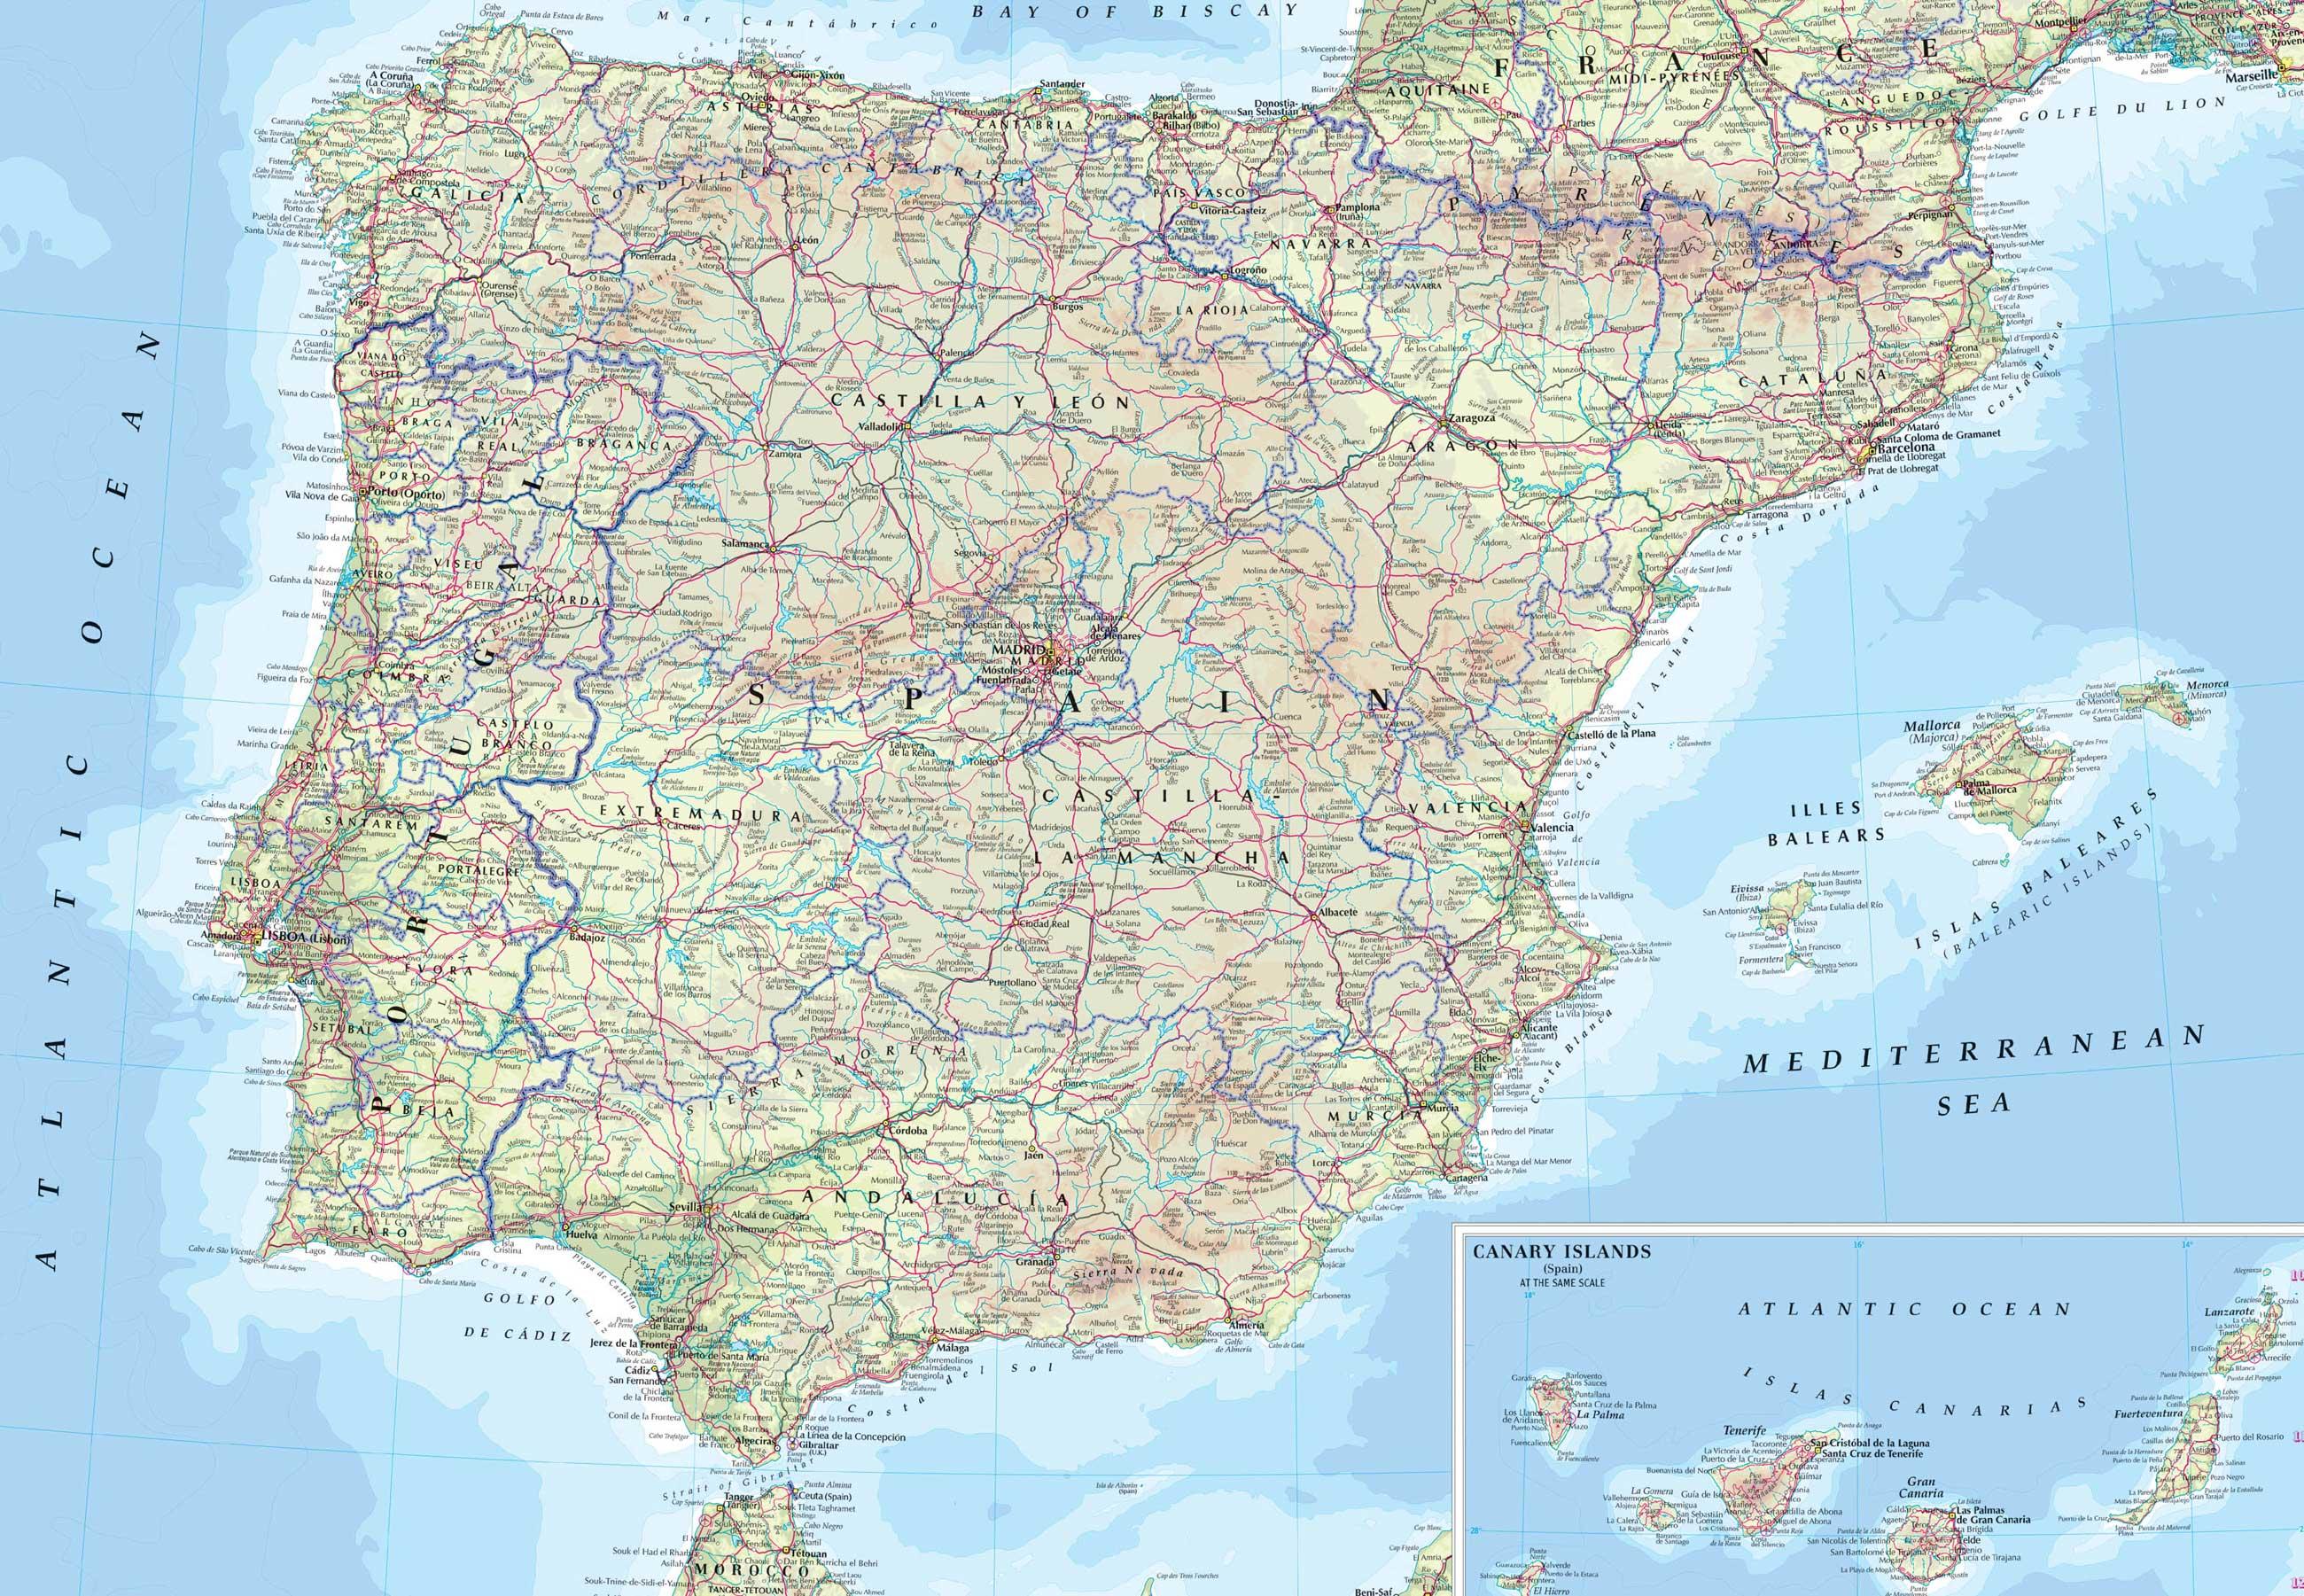 Coches Manuales Mapa De Carreteras De Portugal